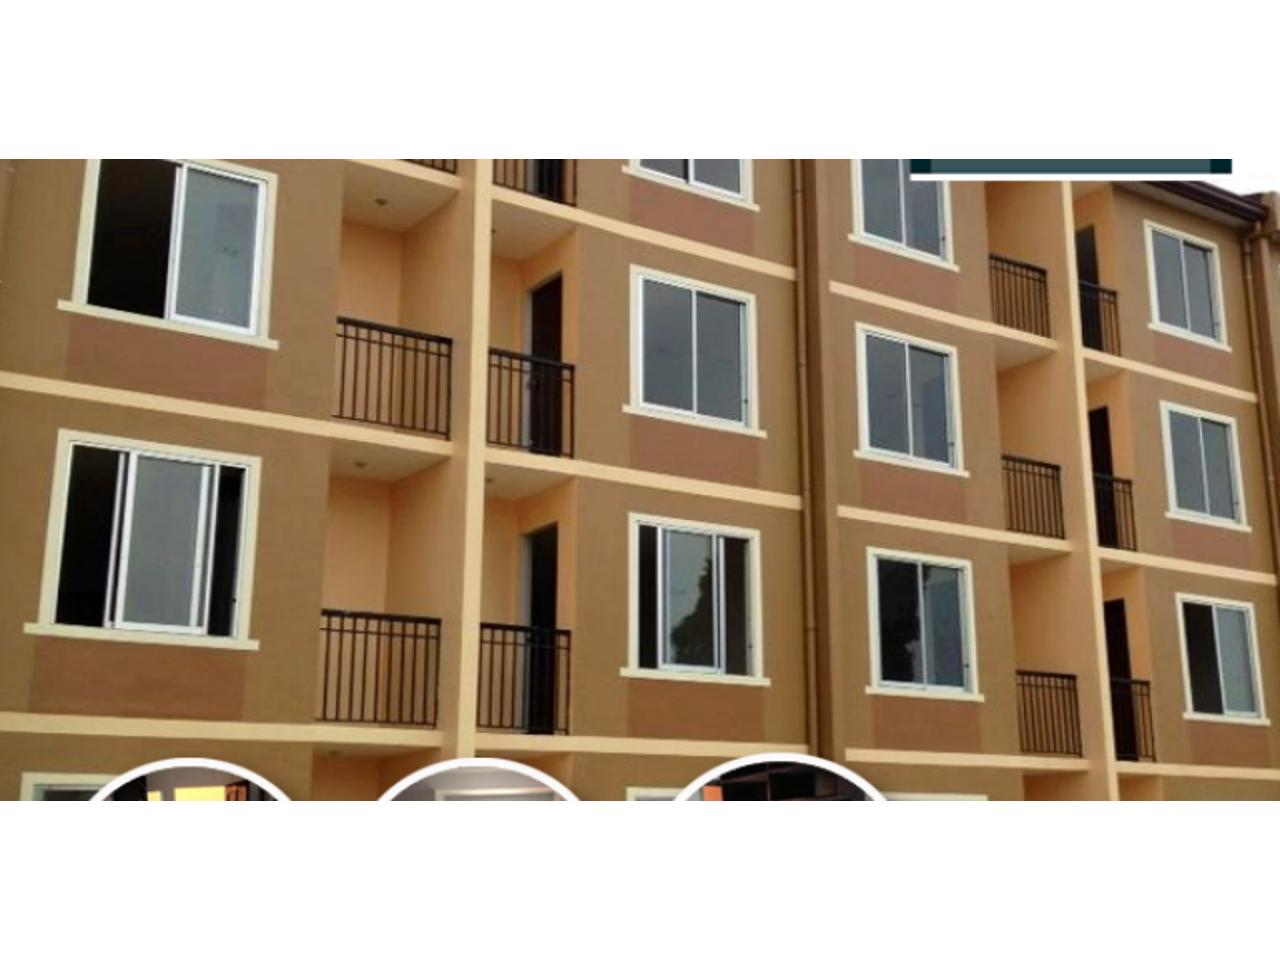 Condominium For sale in Talisay, Cebu, Talisay, Central Visayas